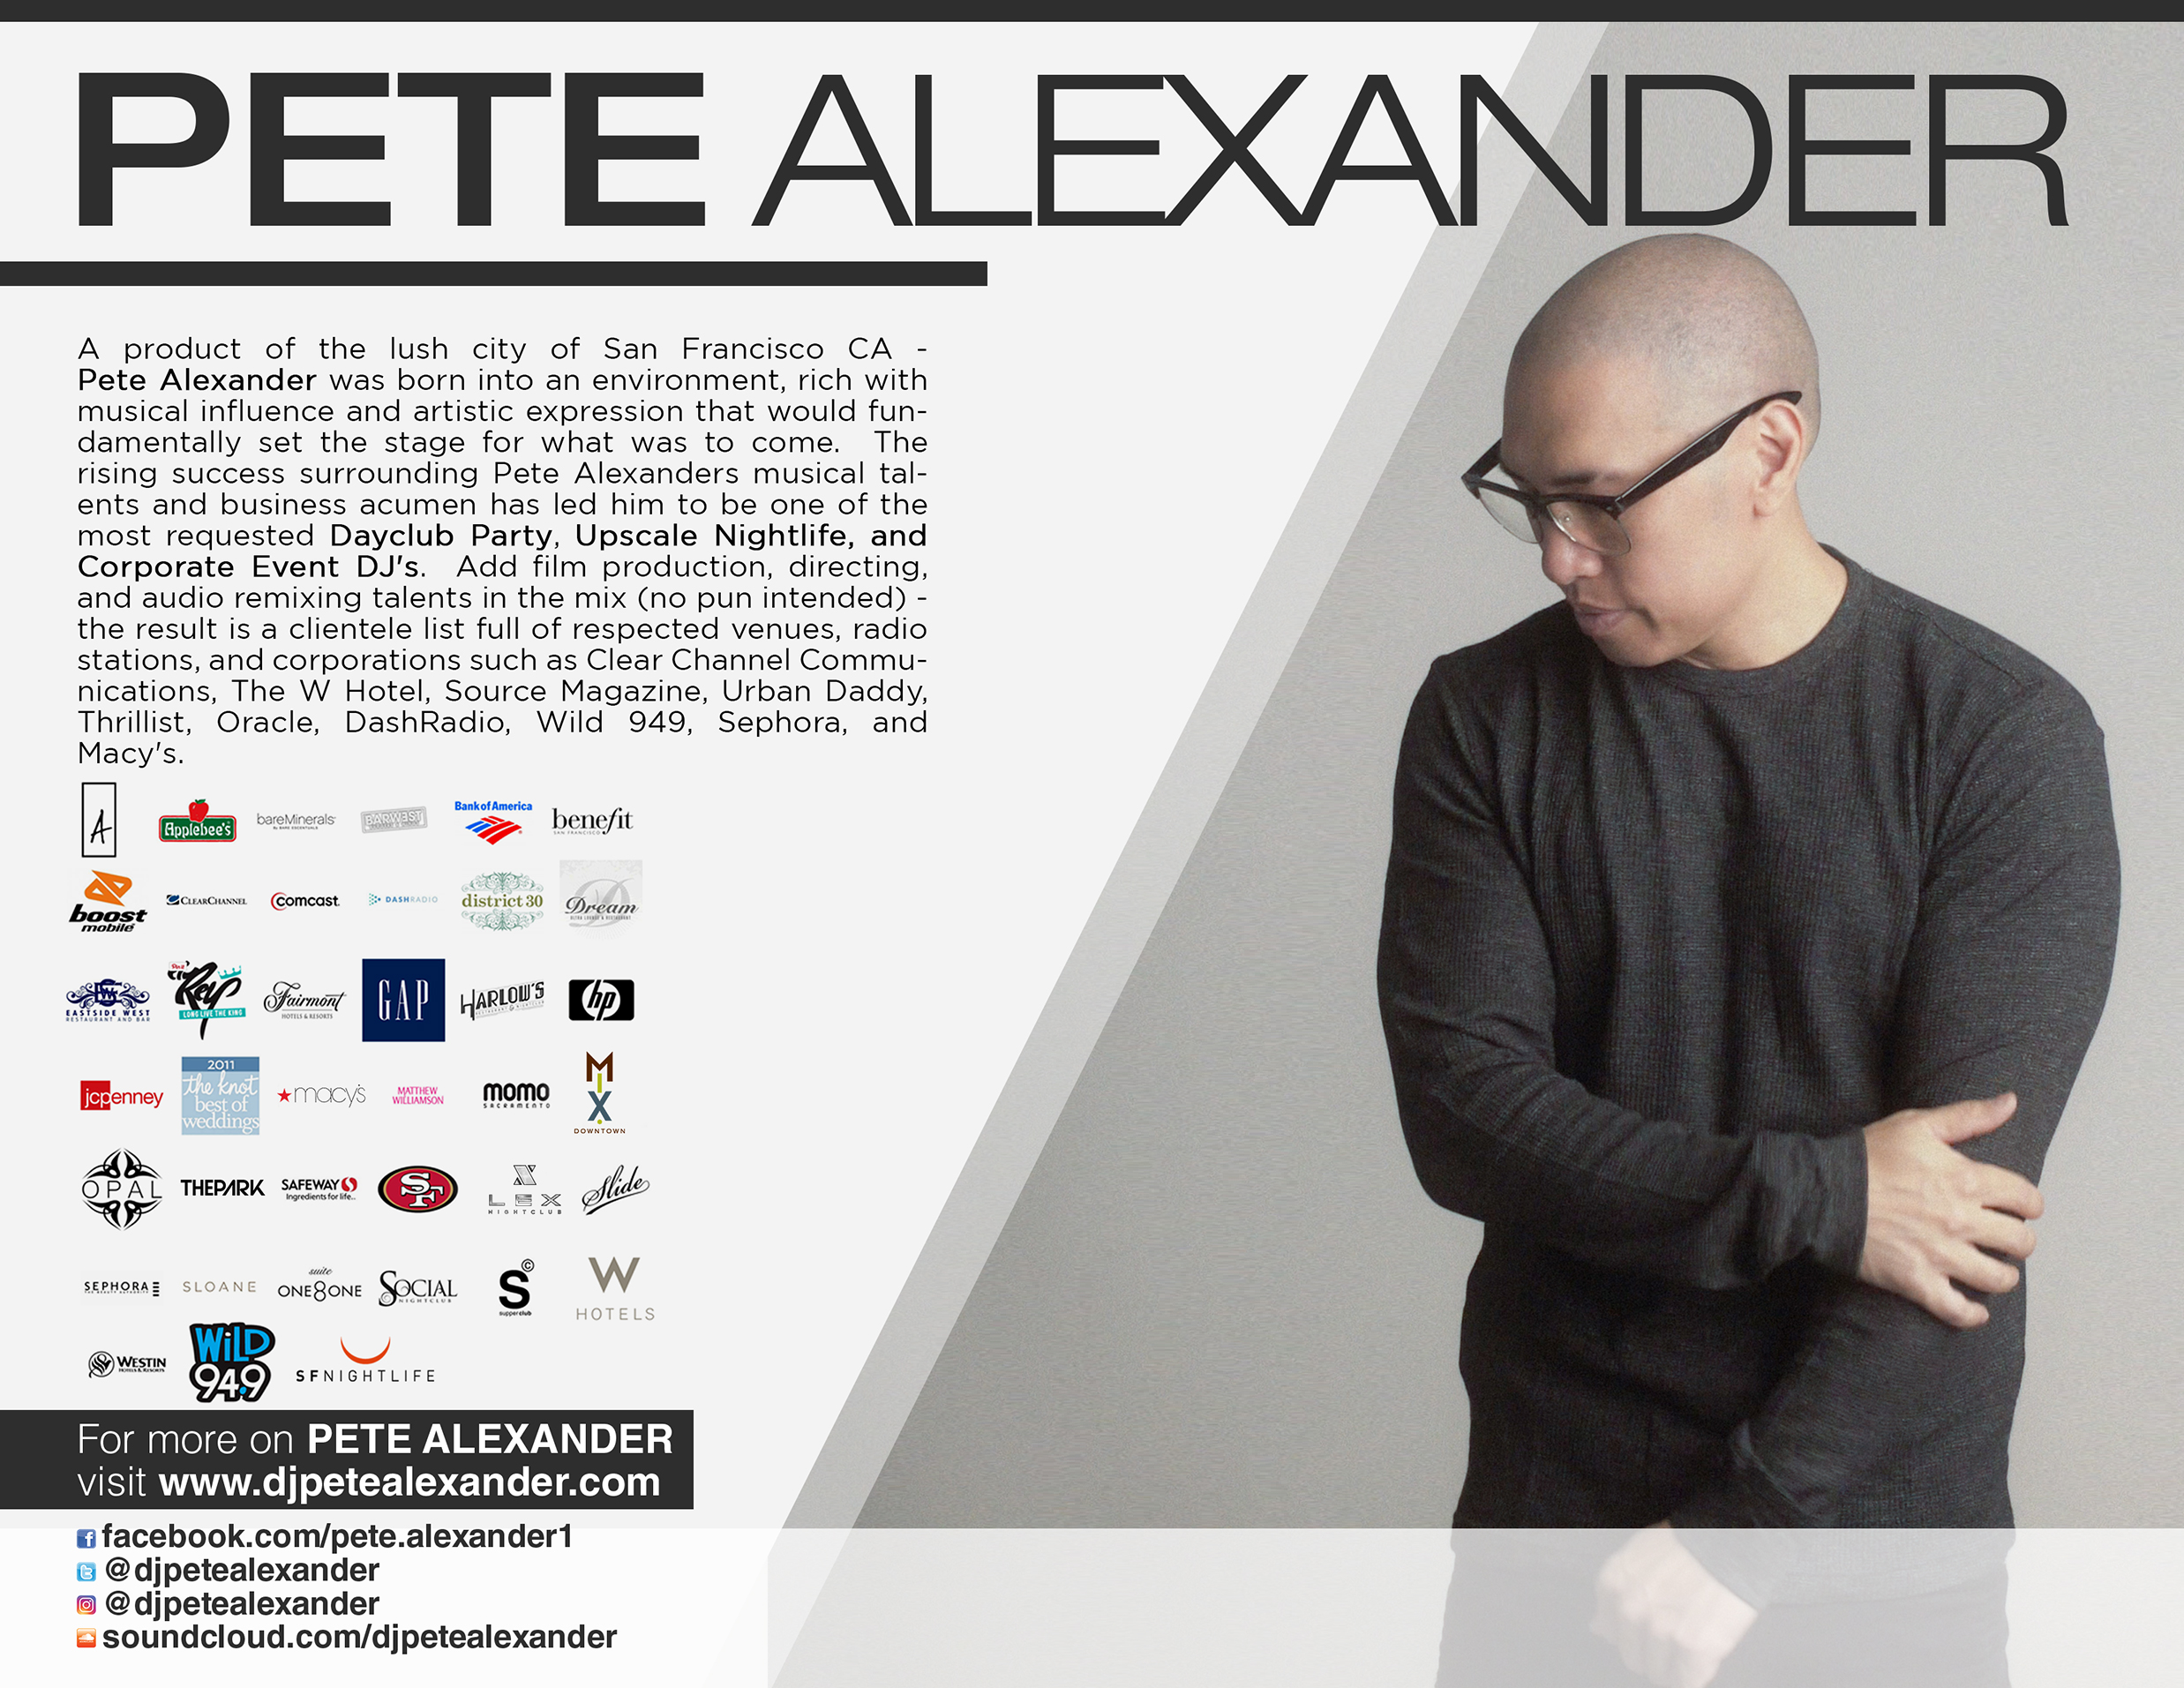 25600---Pete-Alexander---Press-Kit-Request---PAv5WEB-08062018.jpg